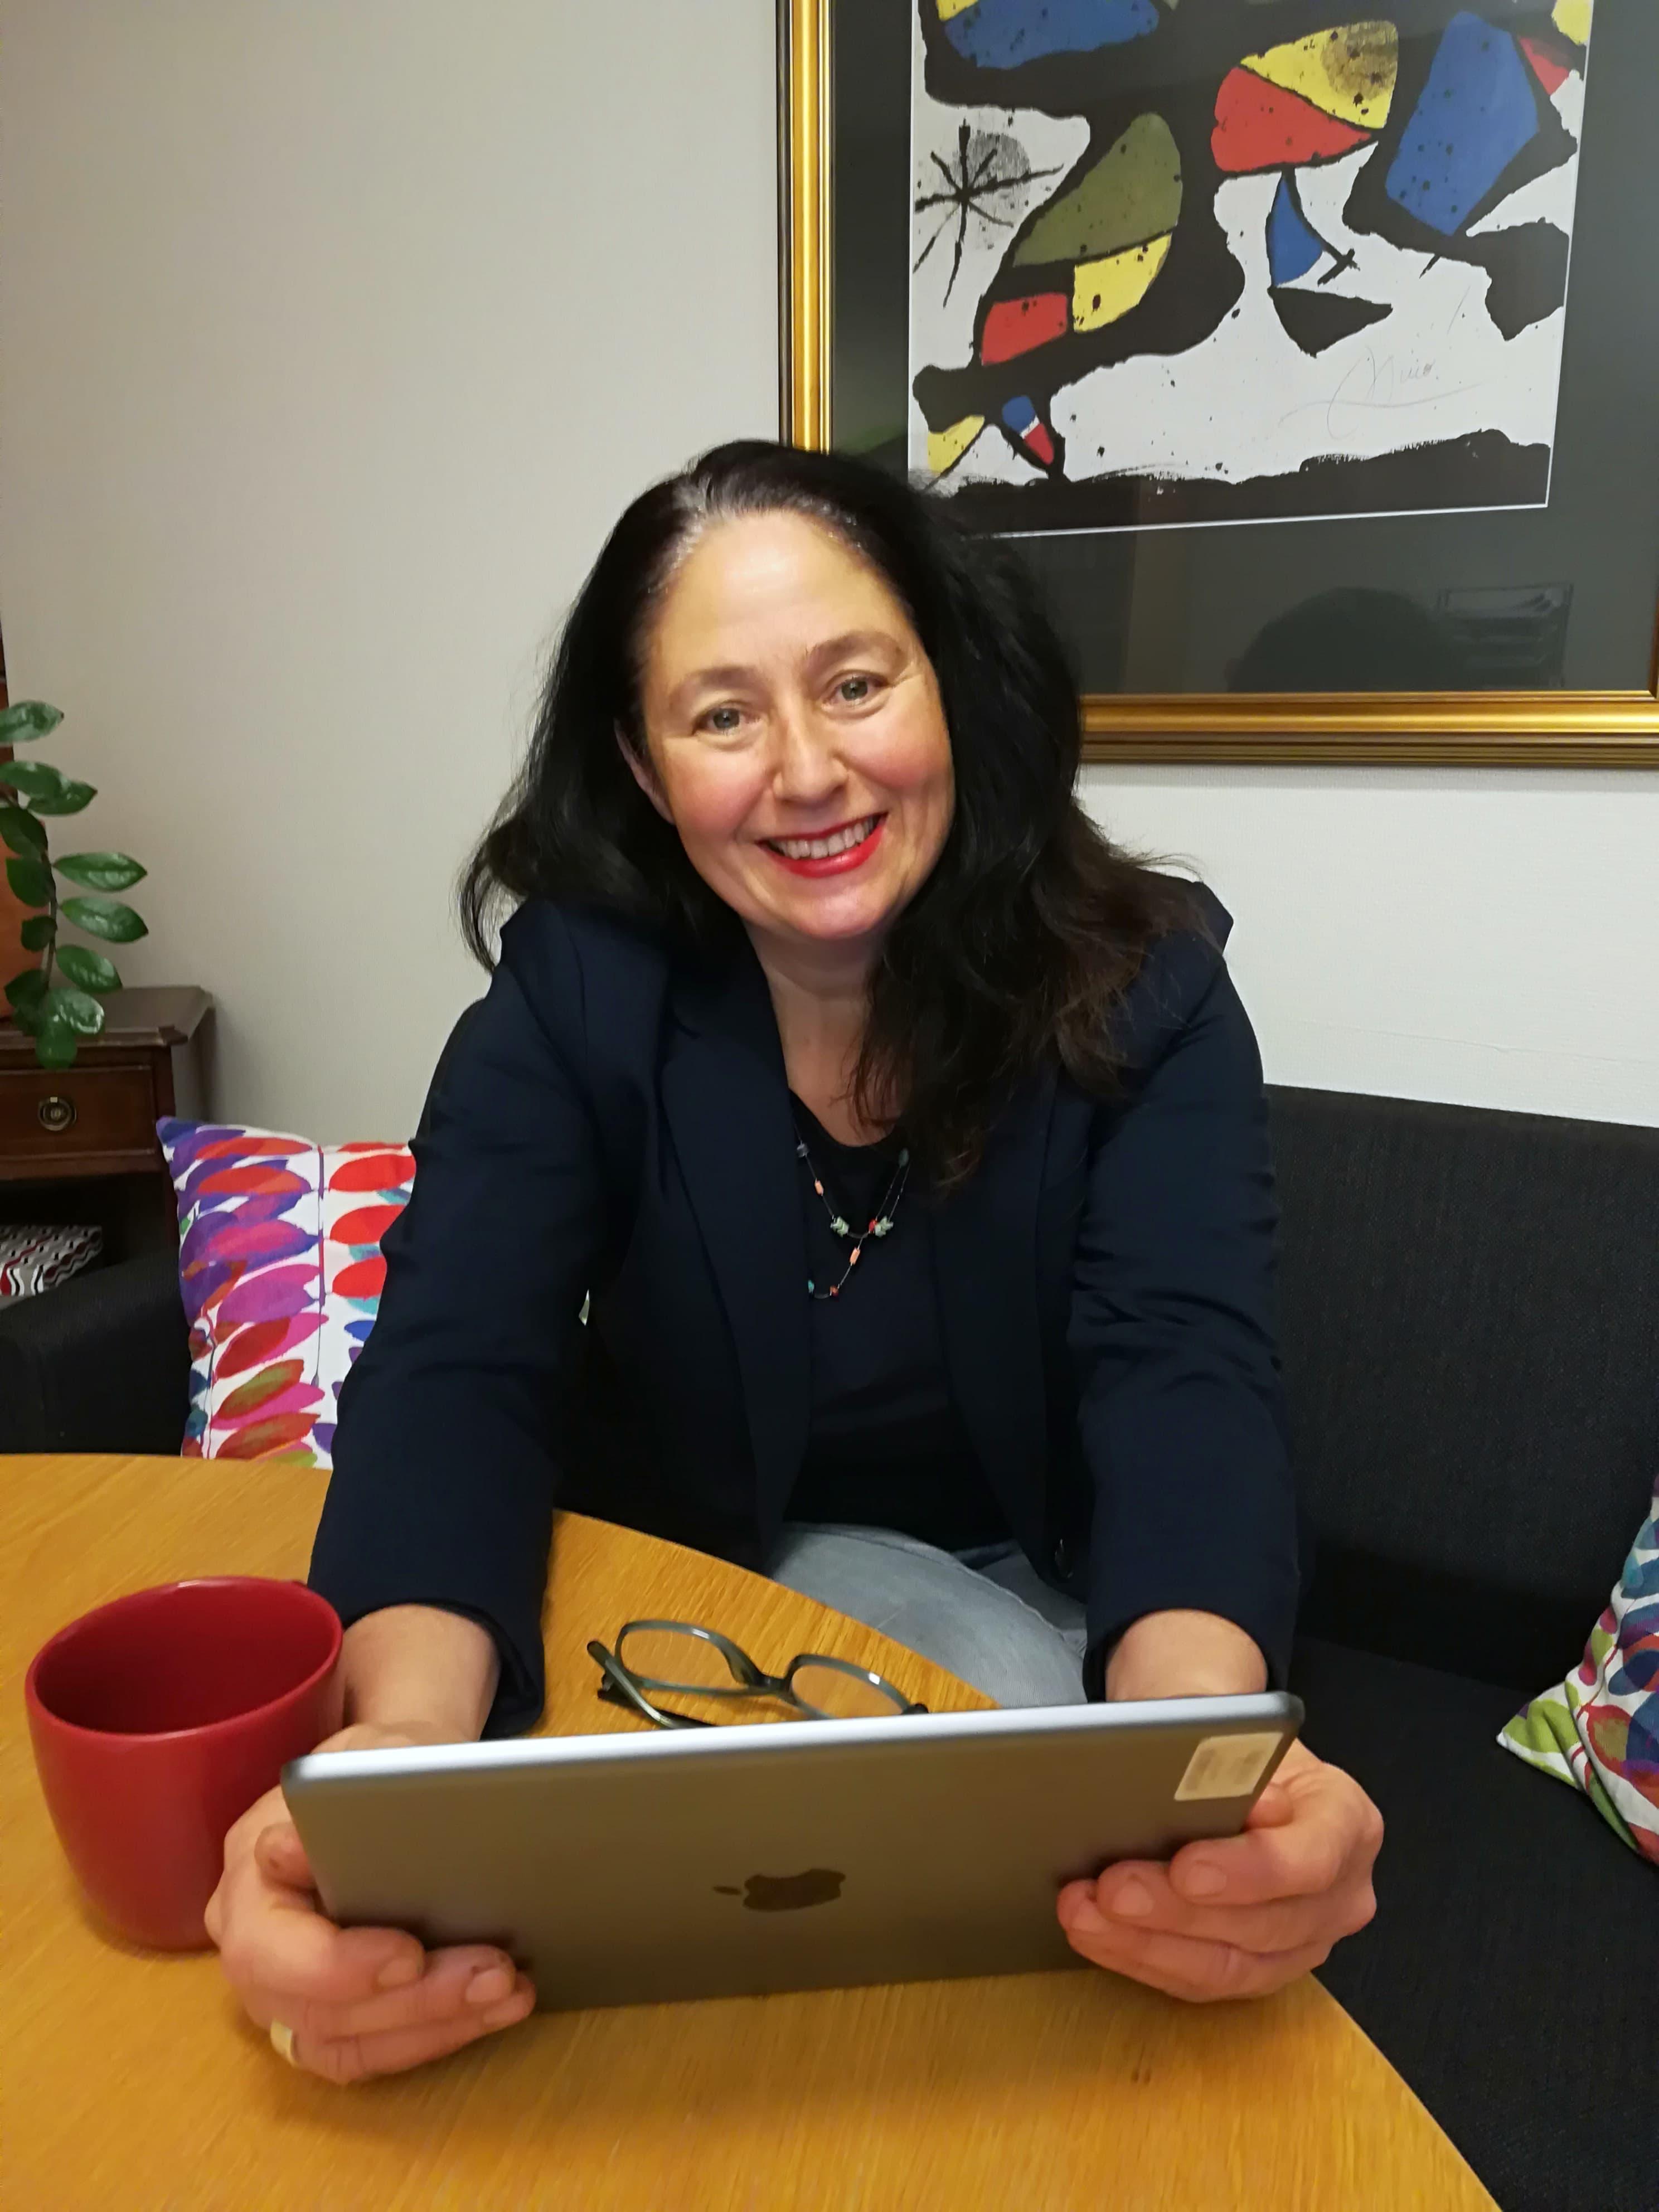 Annette Wolf El-Agroudi